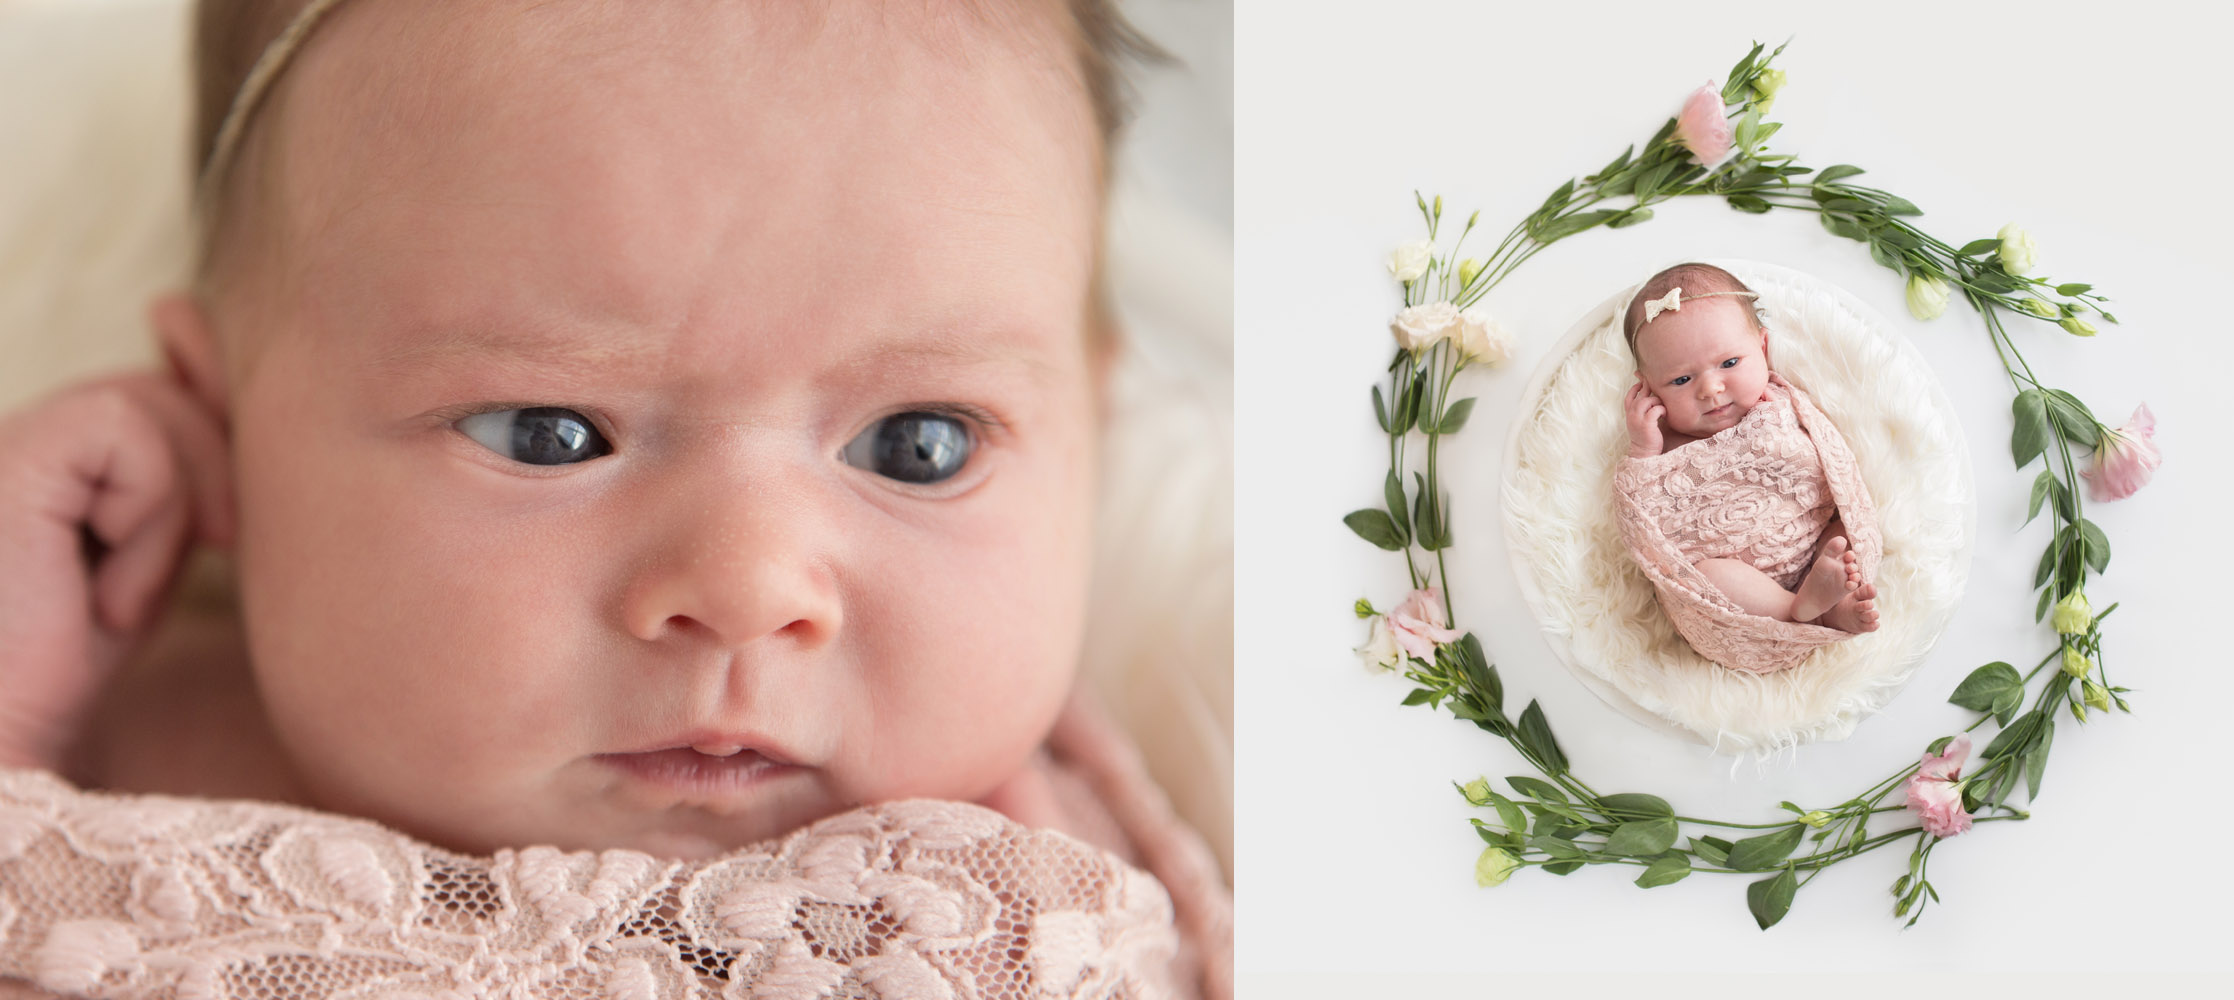 Hamilton-newborn-photography-baby-with-fresh-flowers.jpg